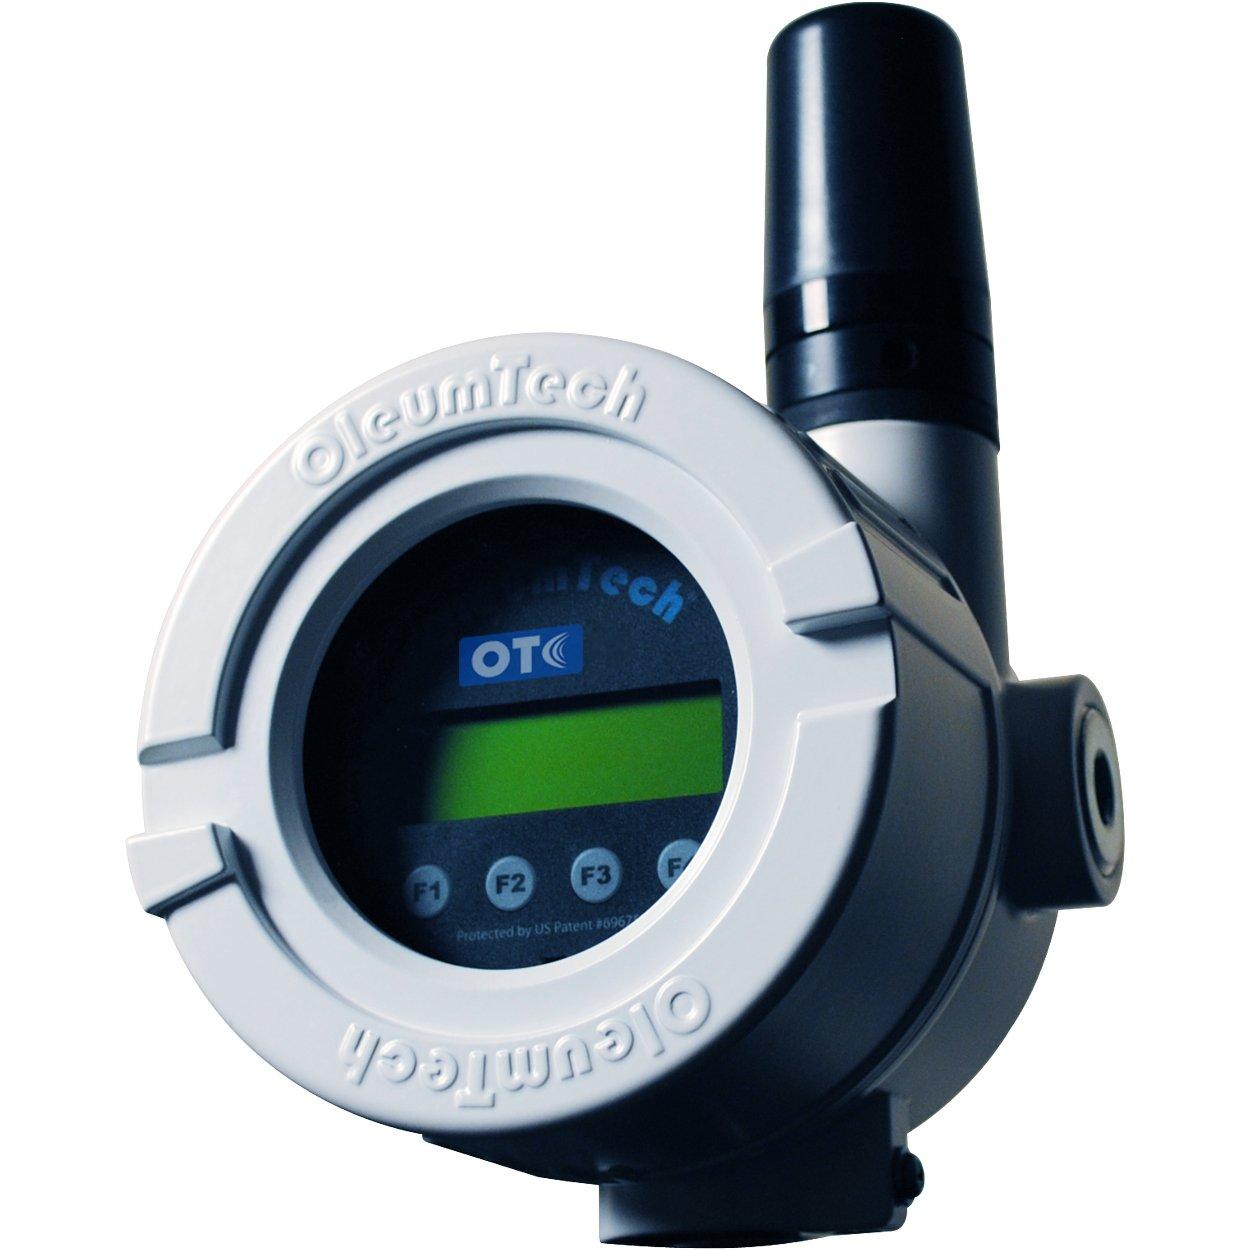 4 wire ultrasonic level transmitter generac 100 amp automatic transfer switch wiring diagram wireless analog input module for otc i o and